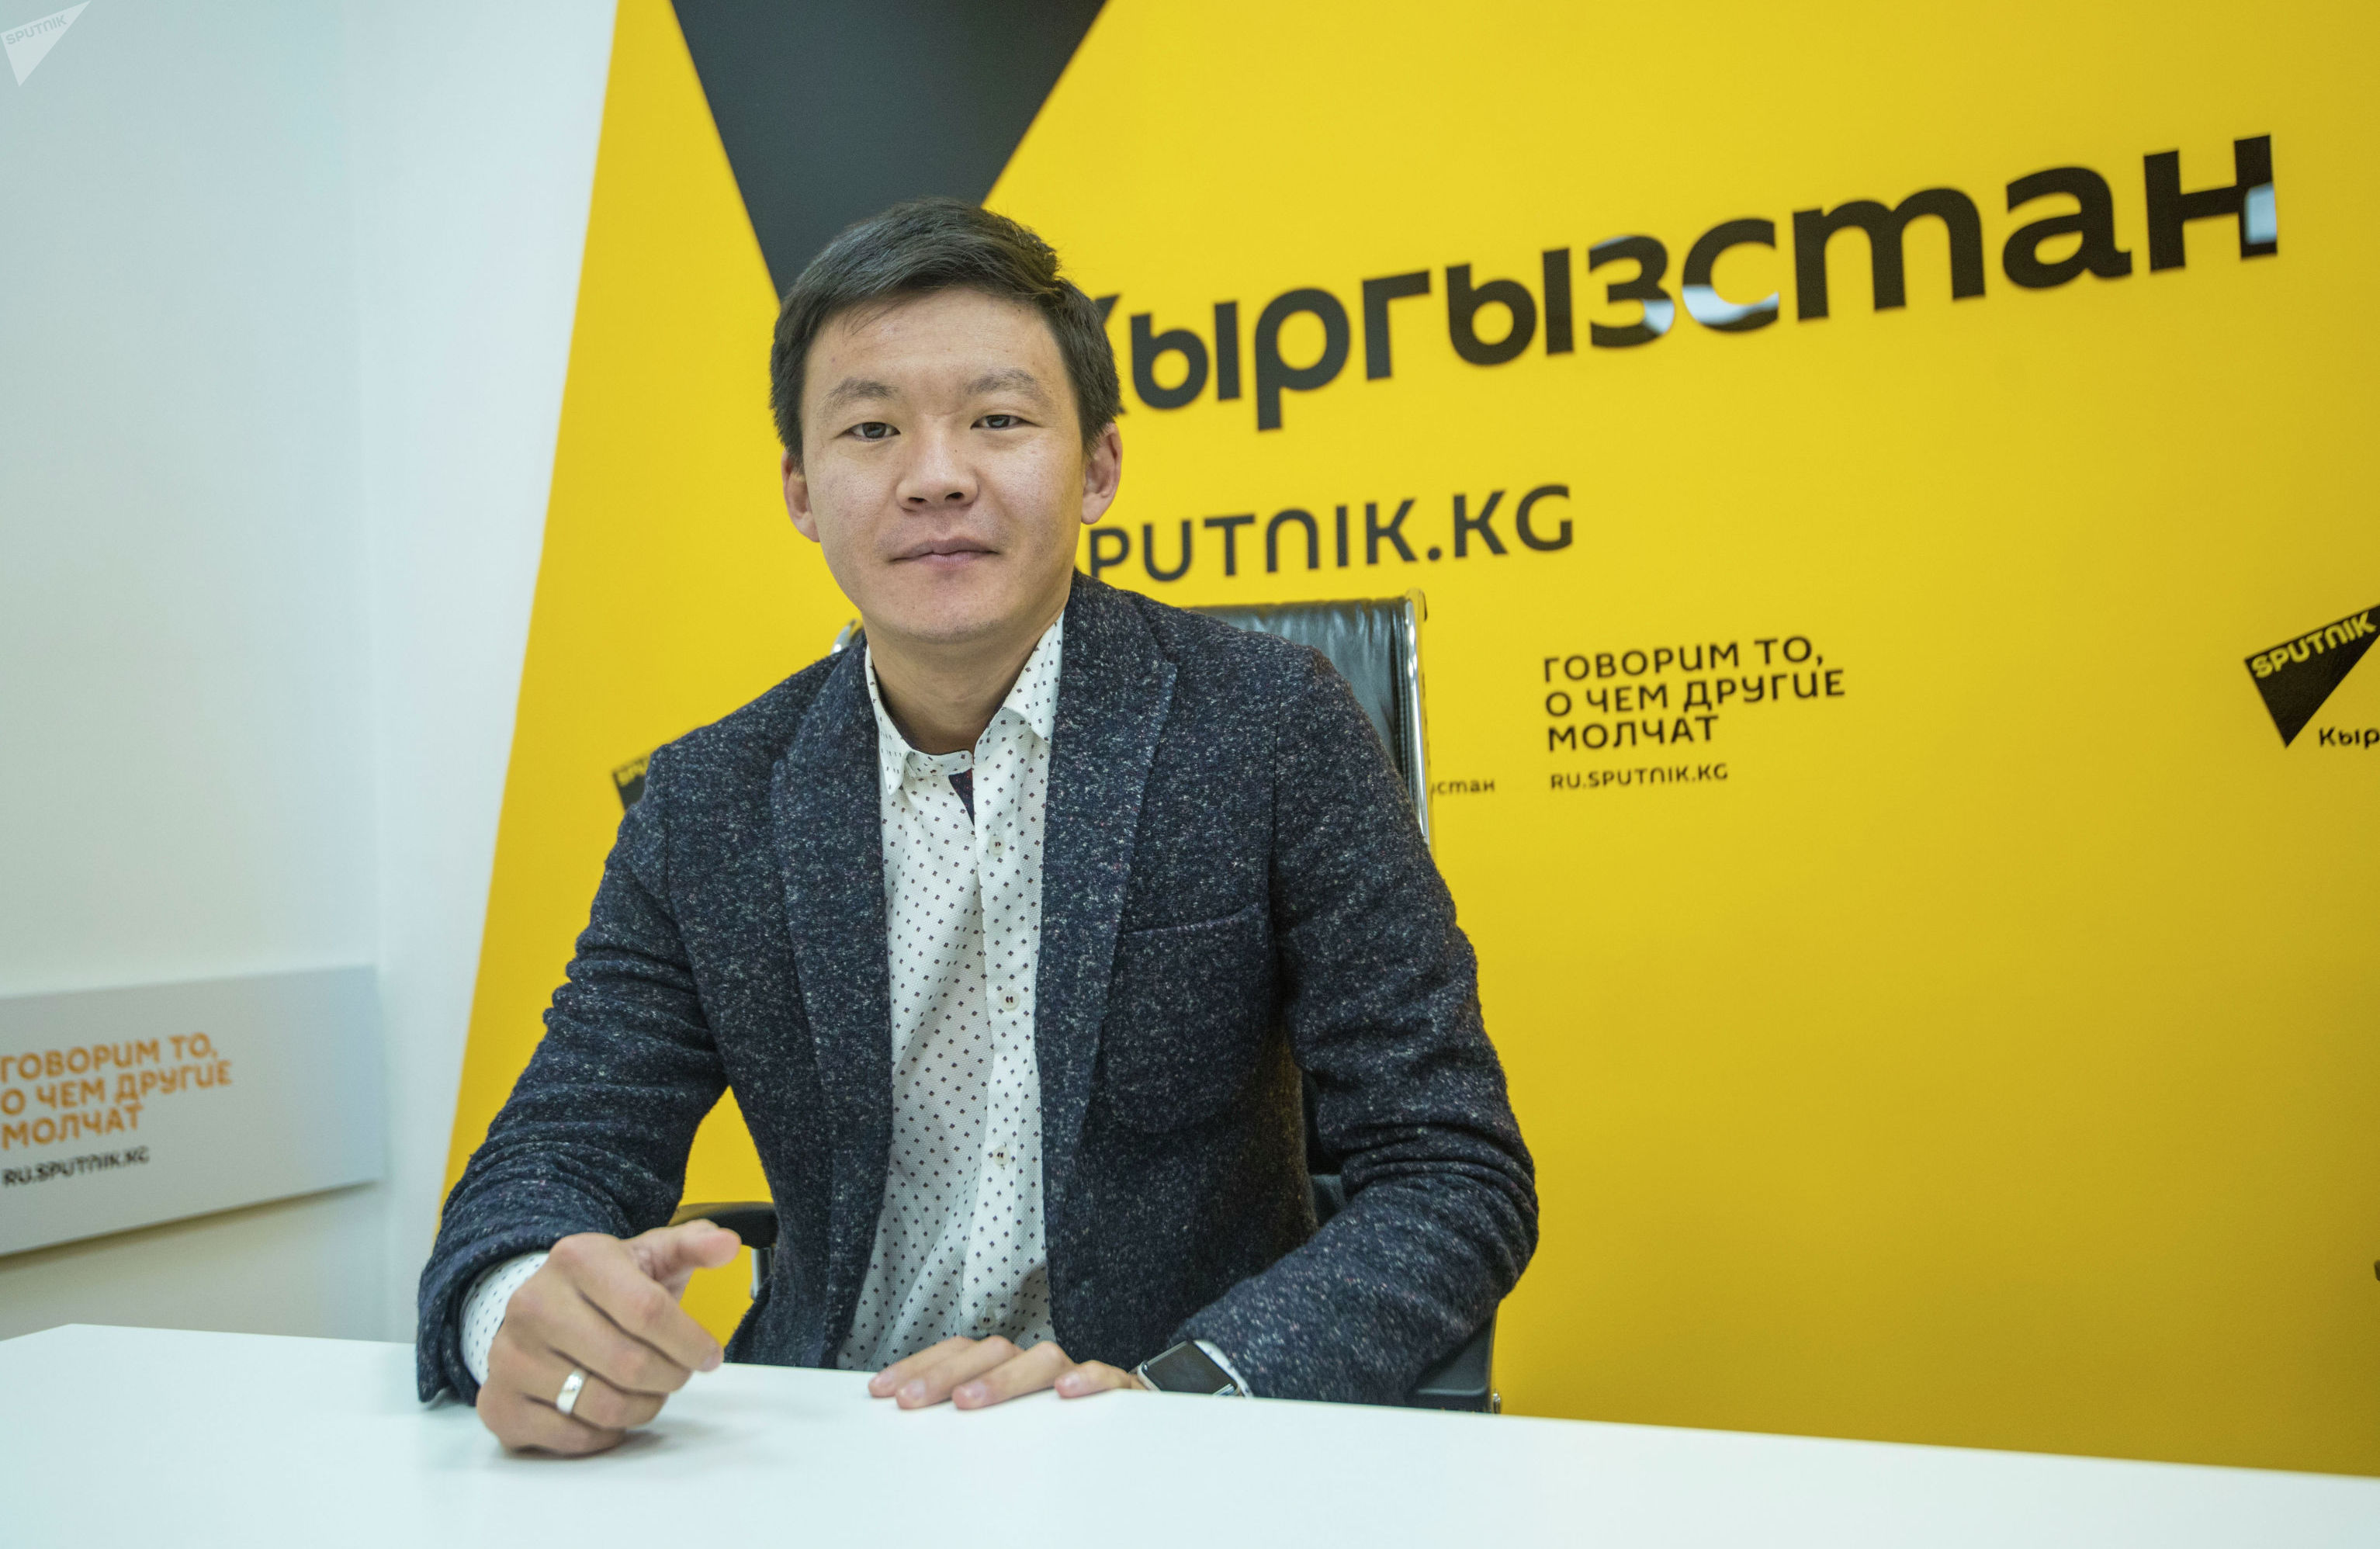 Кыргызстанский юморист, актер и телеведущий Самат Эркинбеков